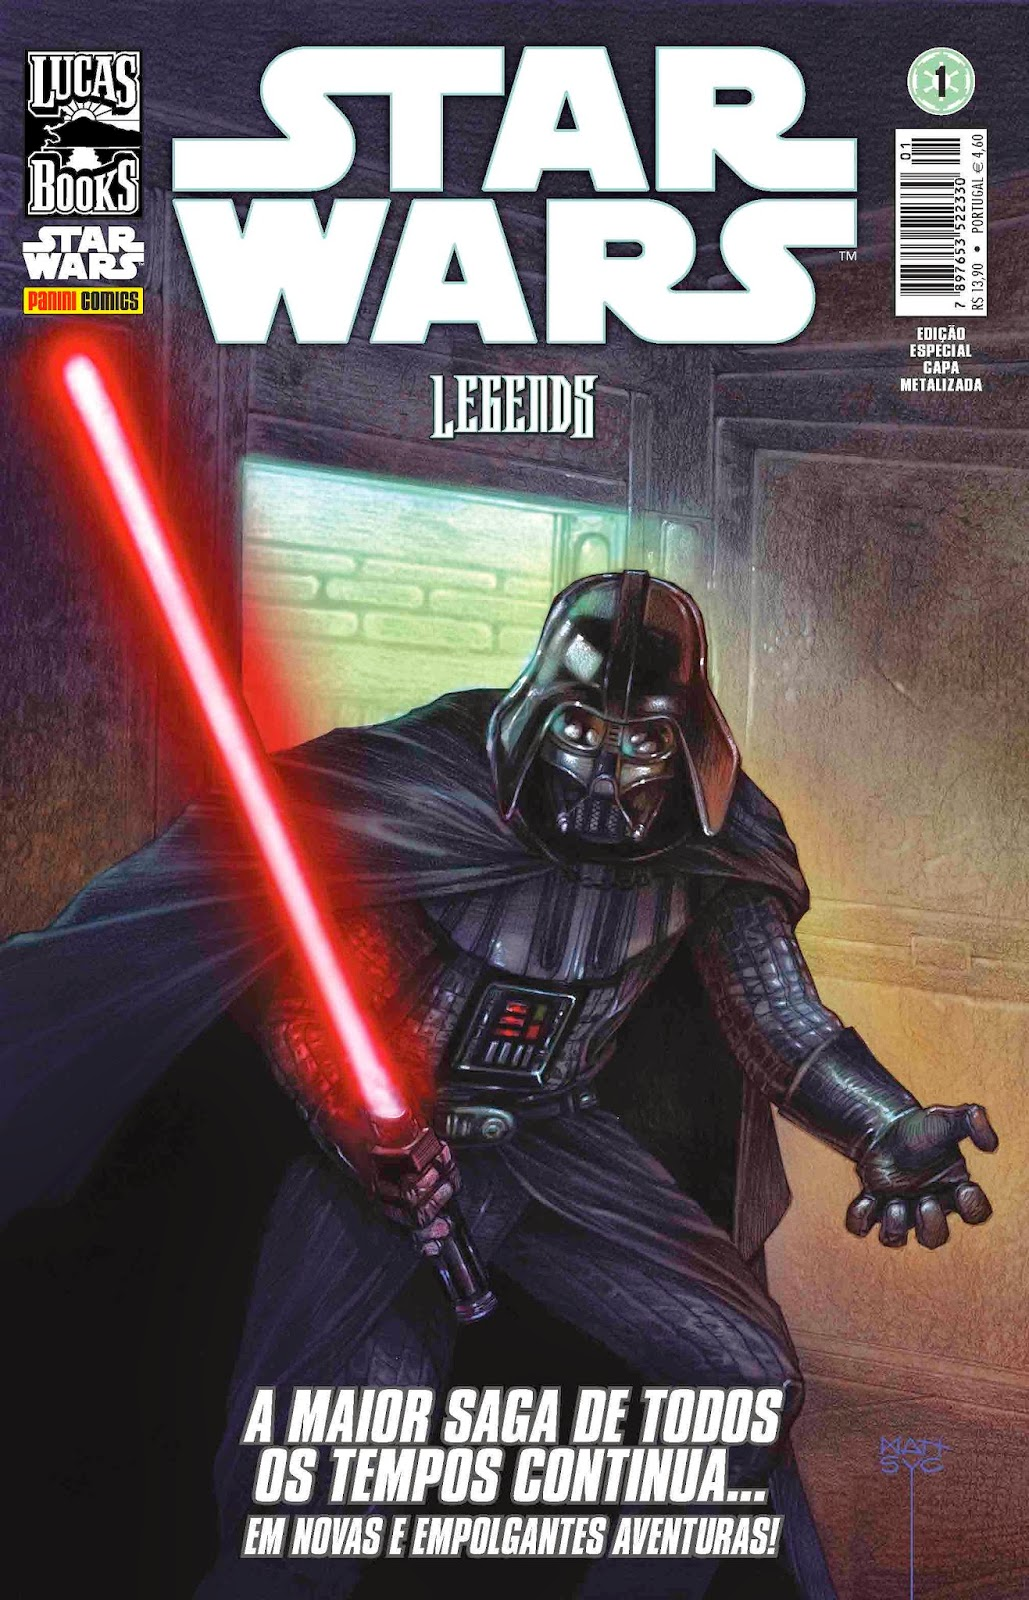 dia de star wars panini comics - May The 4th With You (Dia de Star Wars): tudo o que precisa saber